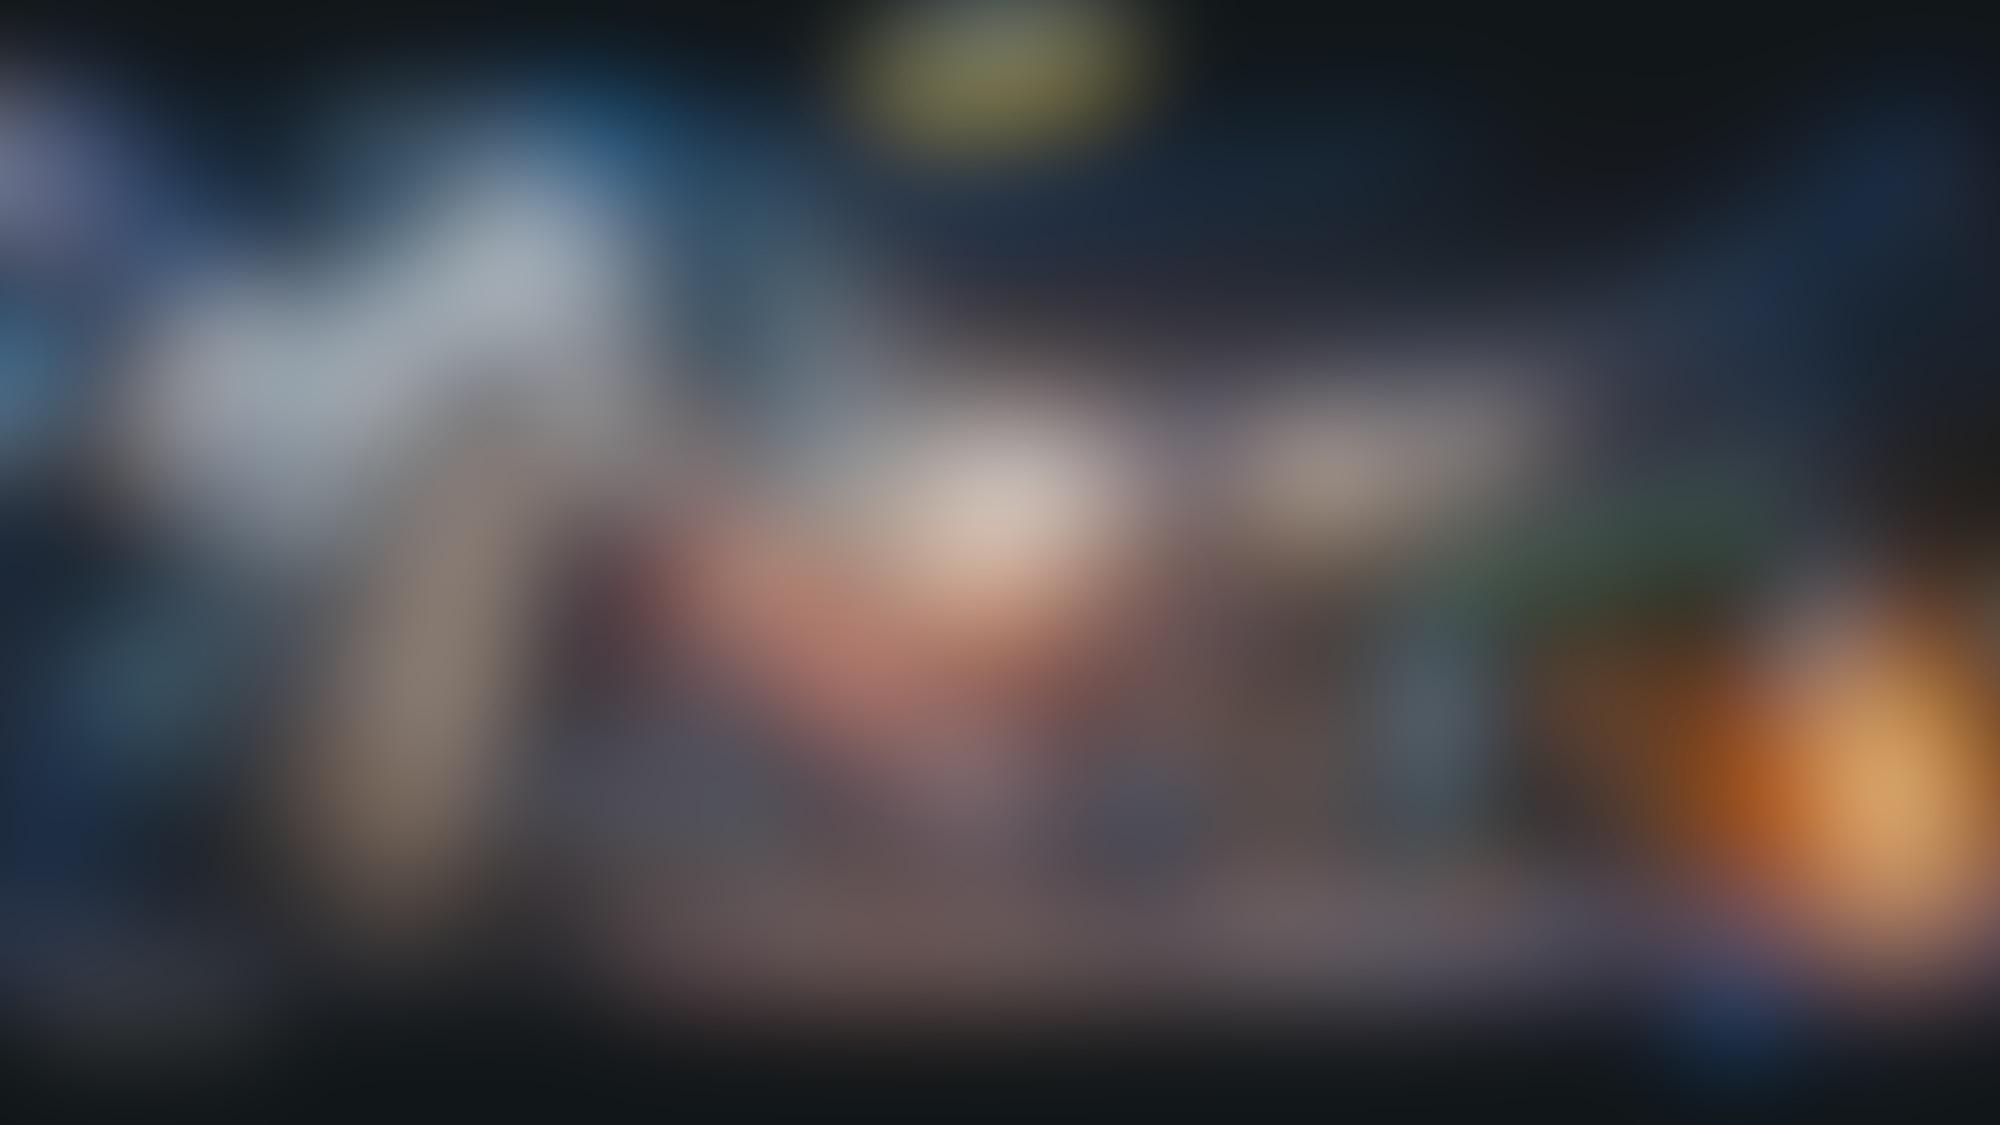 Giorgio Lorenzetti texture artist animation detective pikachu 01 autocompressfitresizeixlibphp 1 1 0max h2000max w3 D2000q80s775475c13473e260602e448adfc4af03